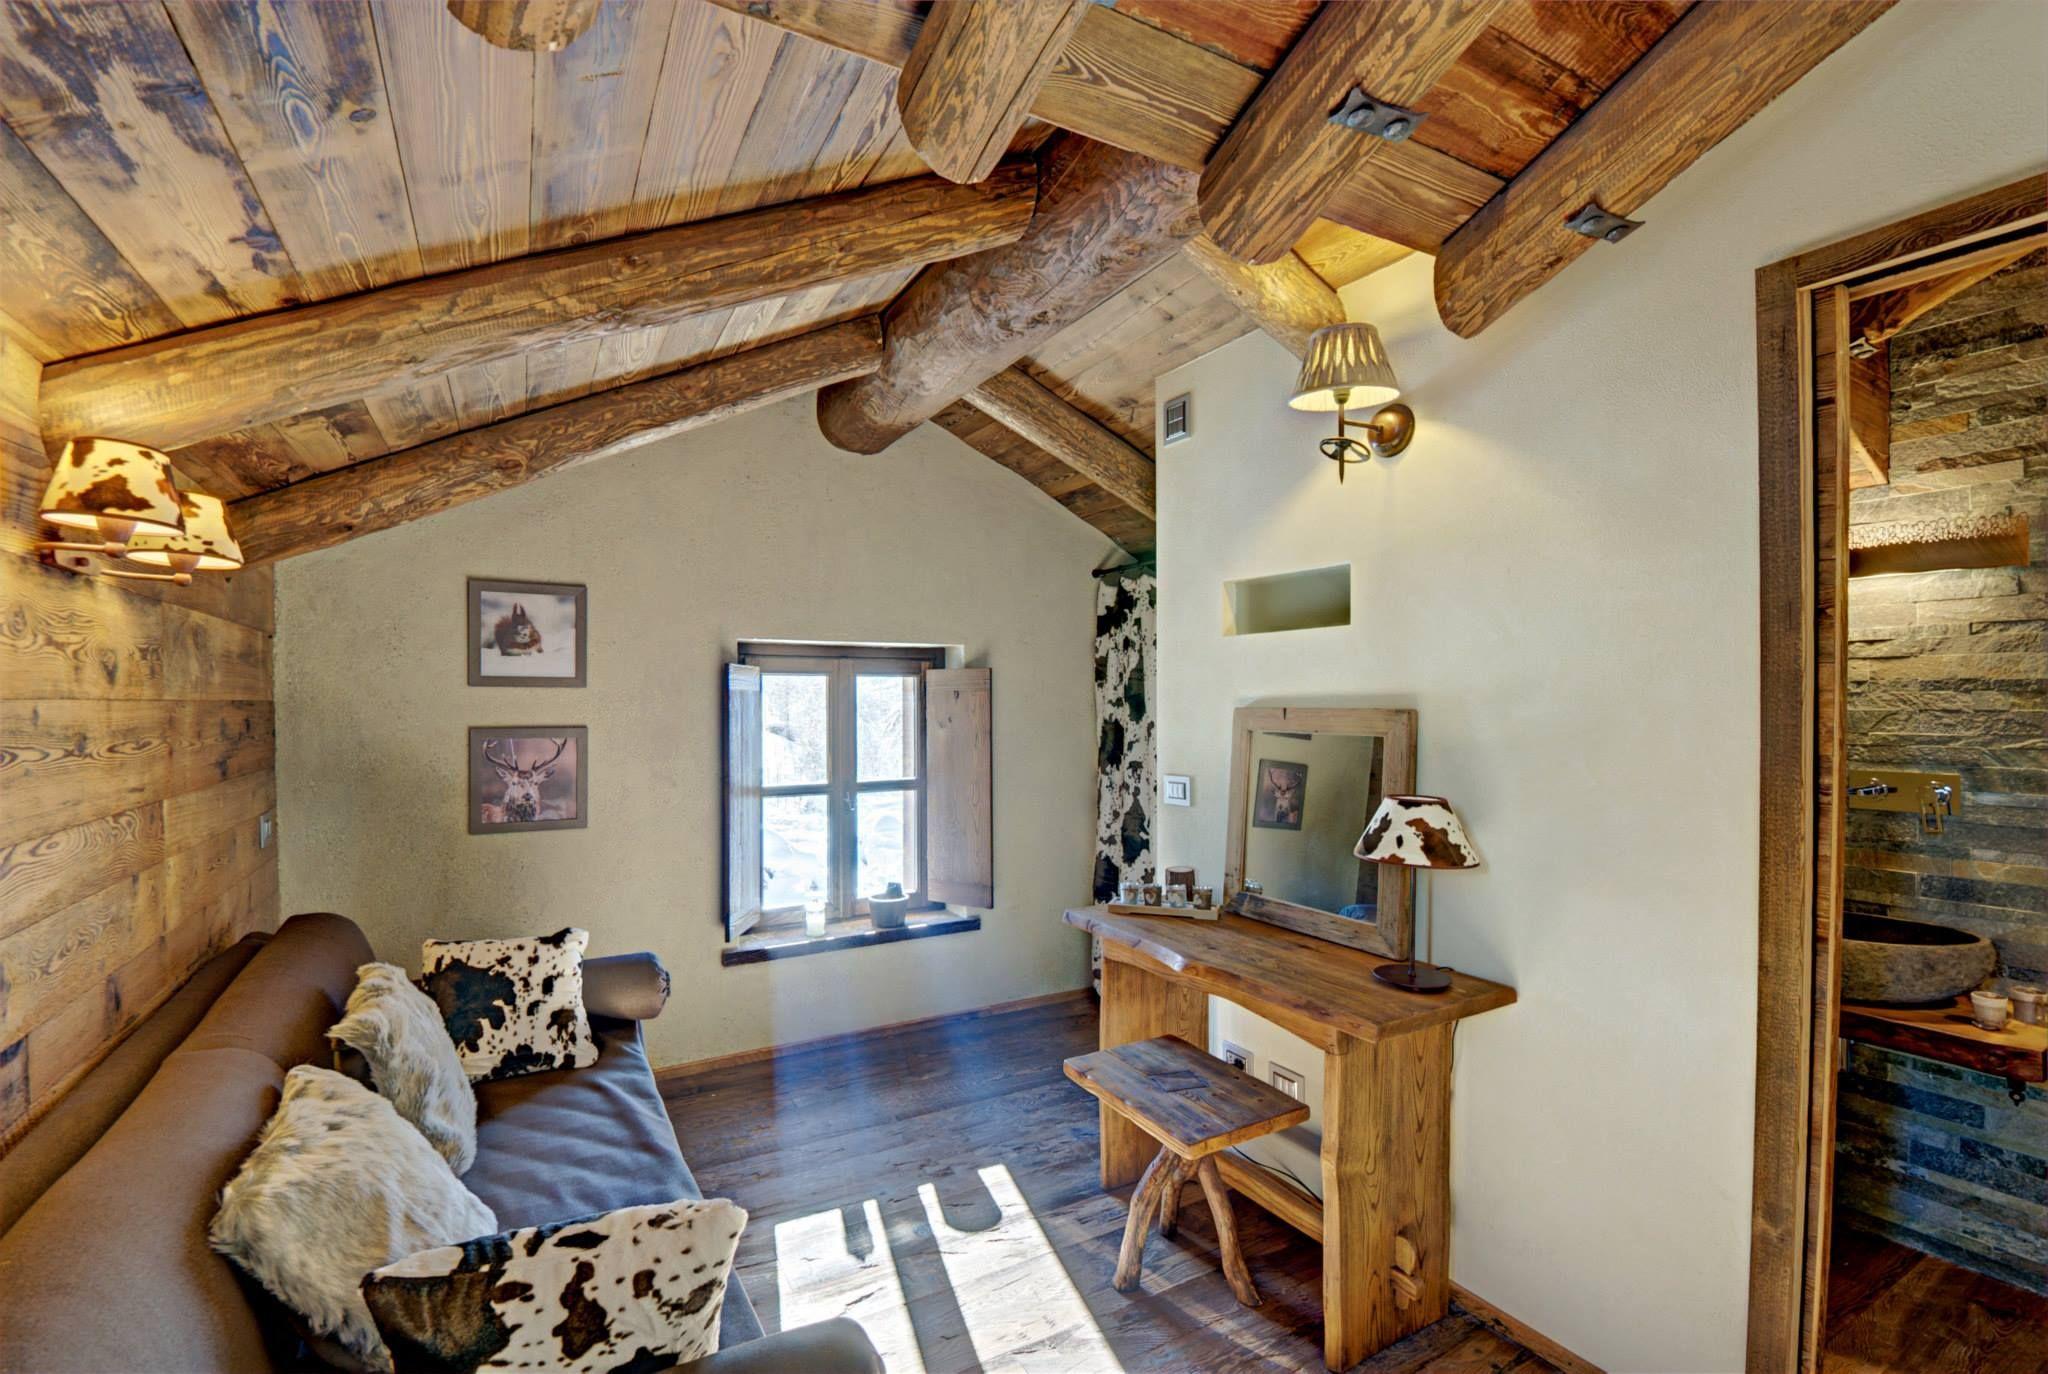 Pin de gisela s nchez serra en rustico pinterest casas - Decoracion de casas rusticas interiores ...